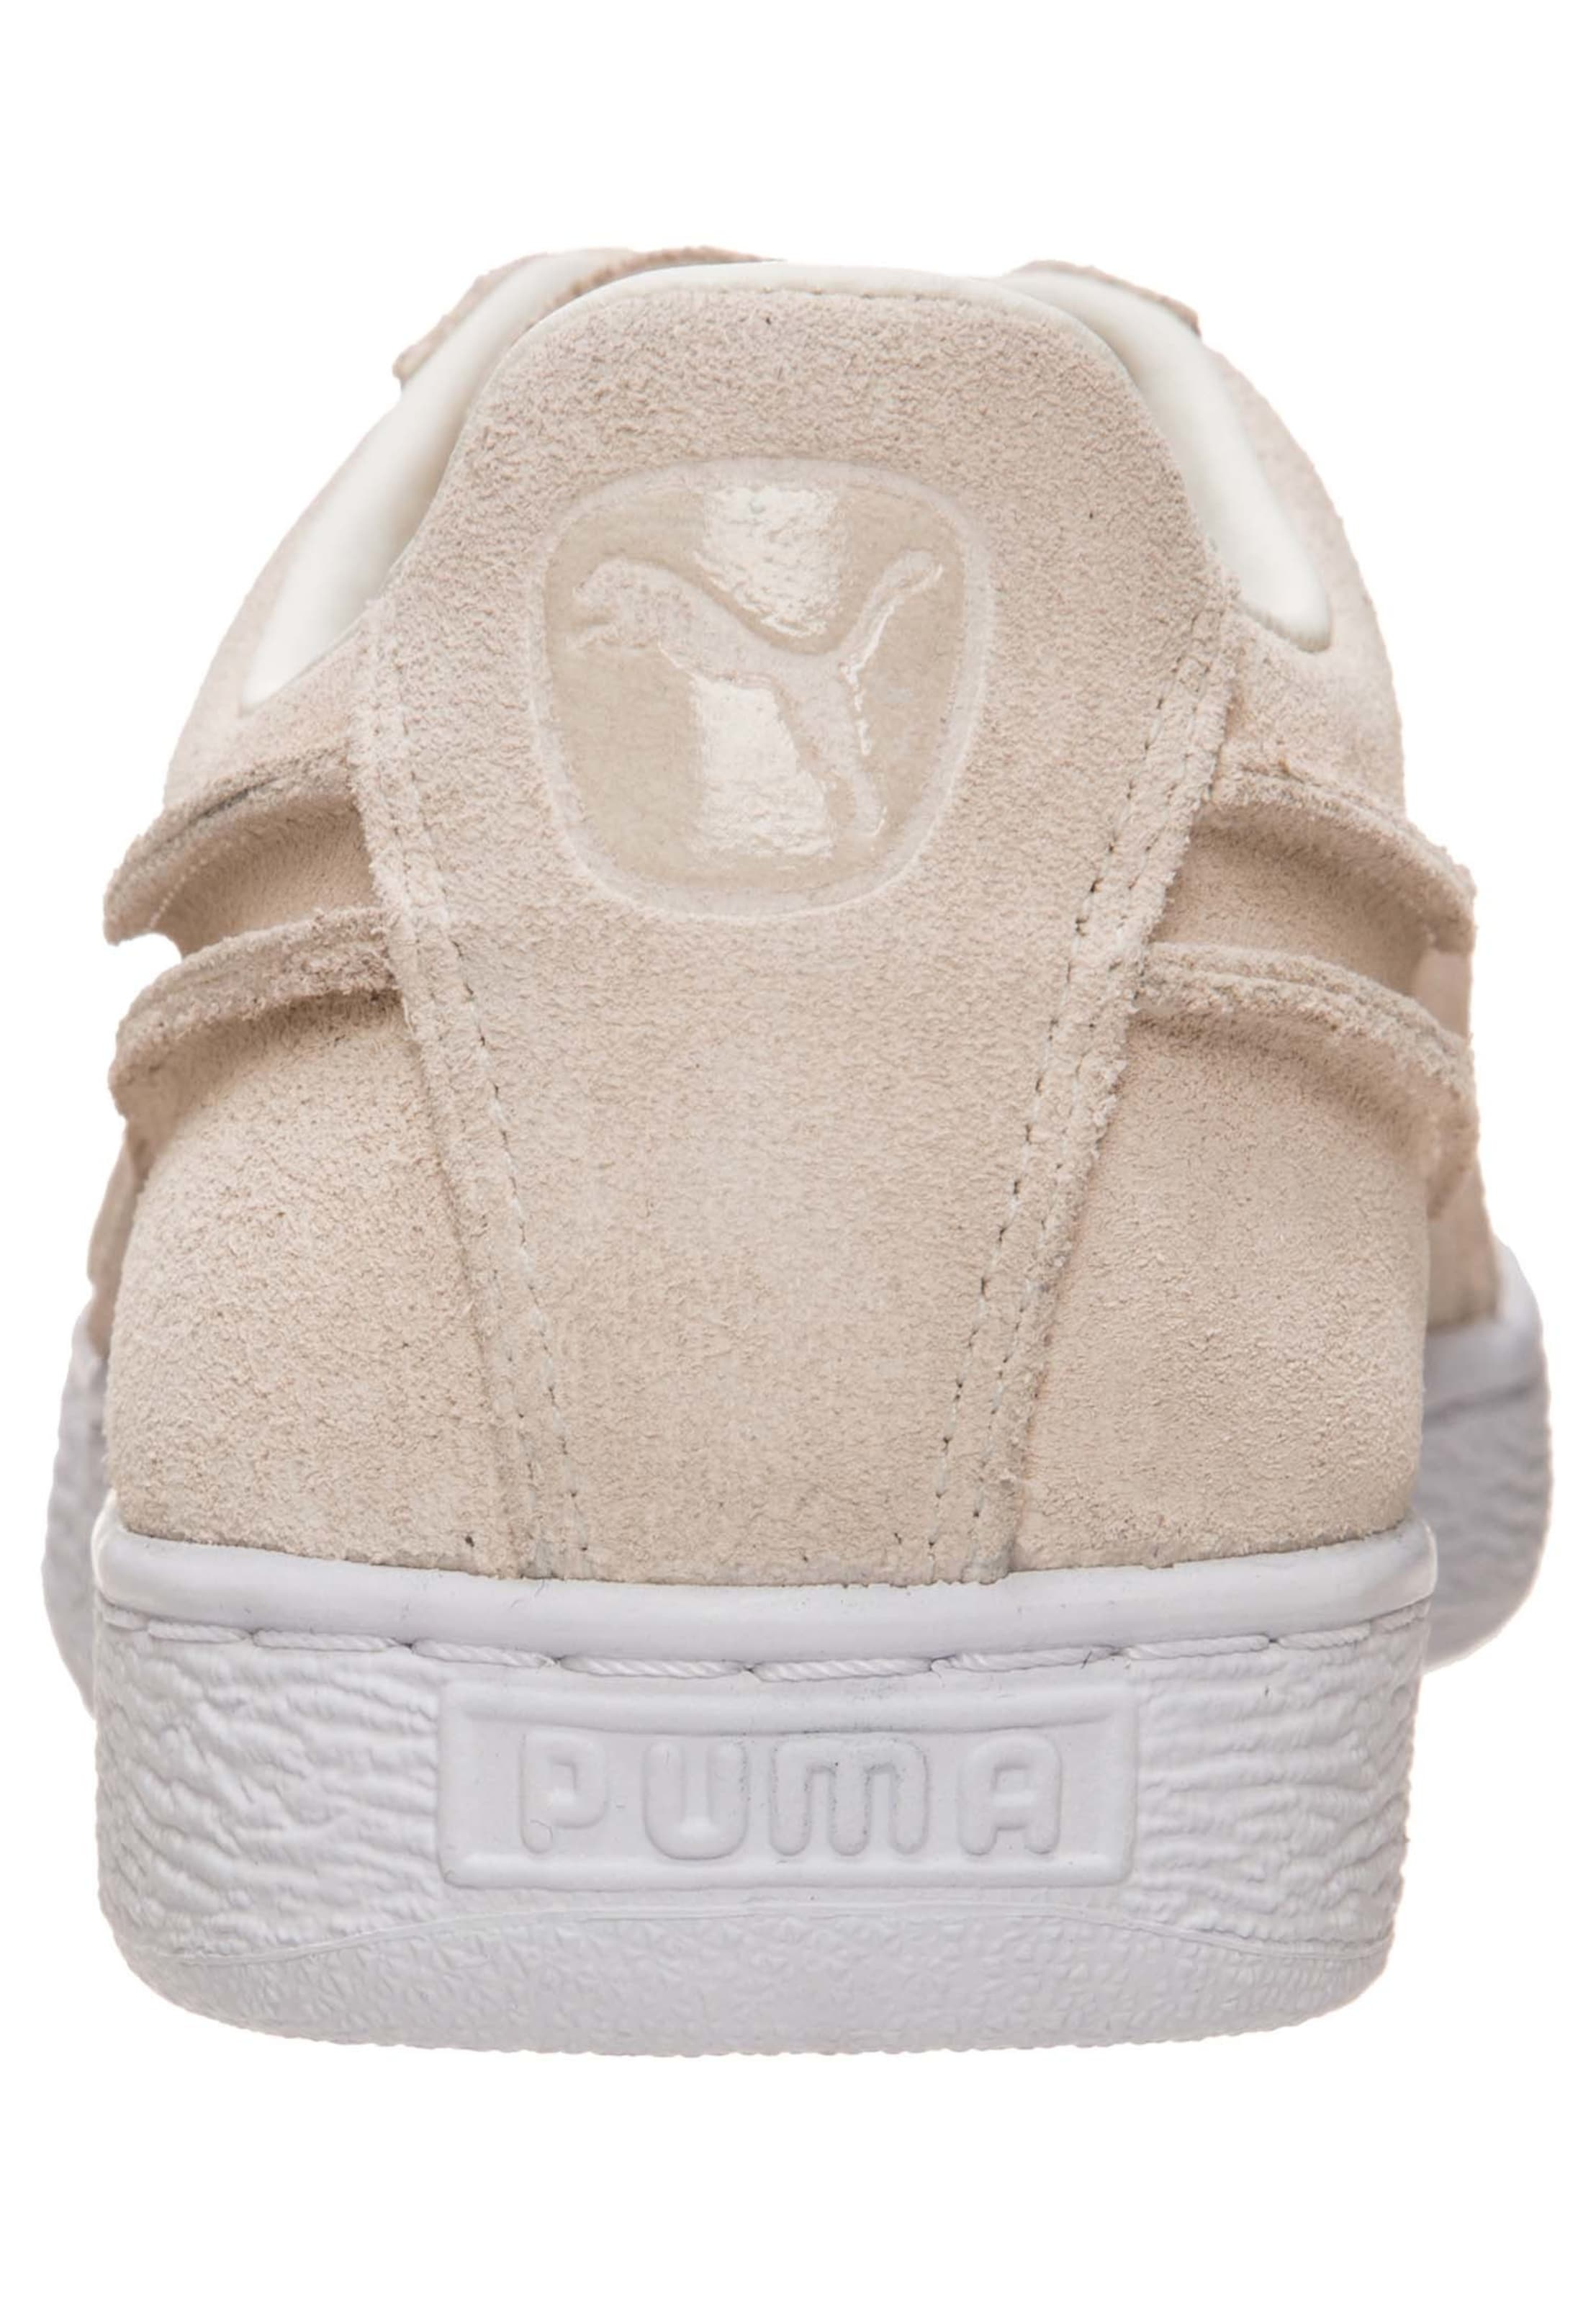 Seams' Basses 'suede Baskets Beige En Exposed Puma Classic 3j5A4LqR